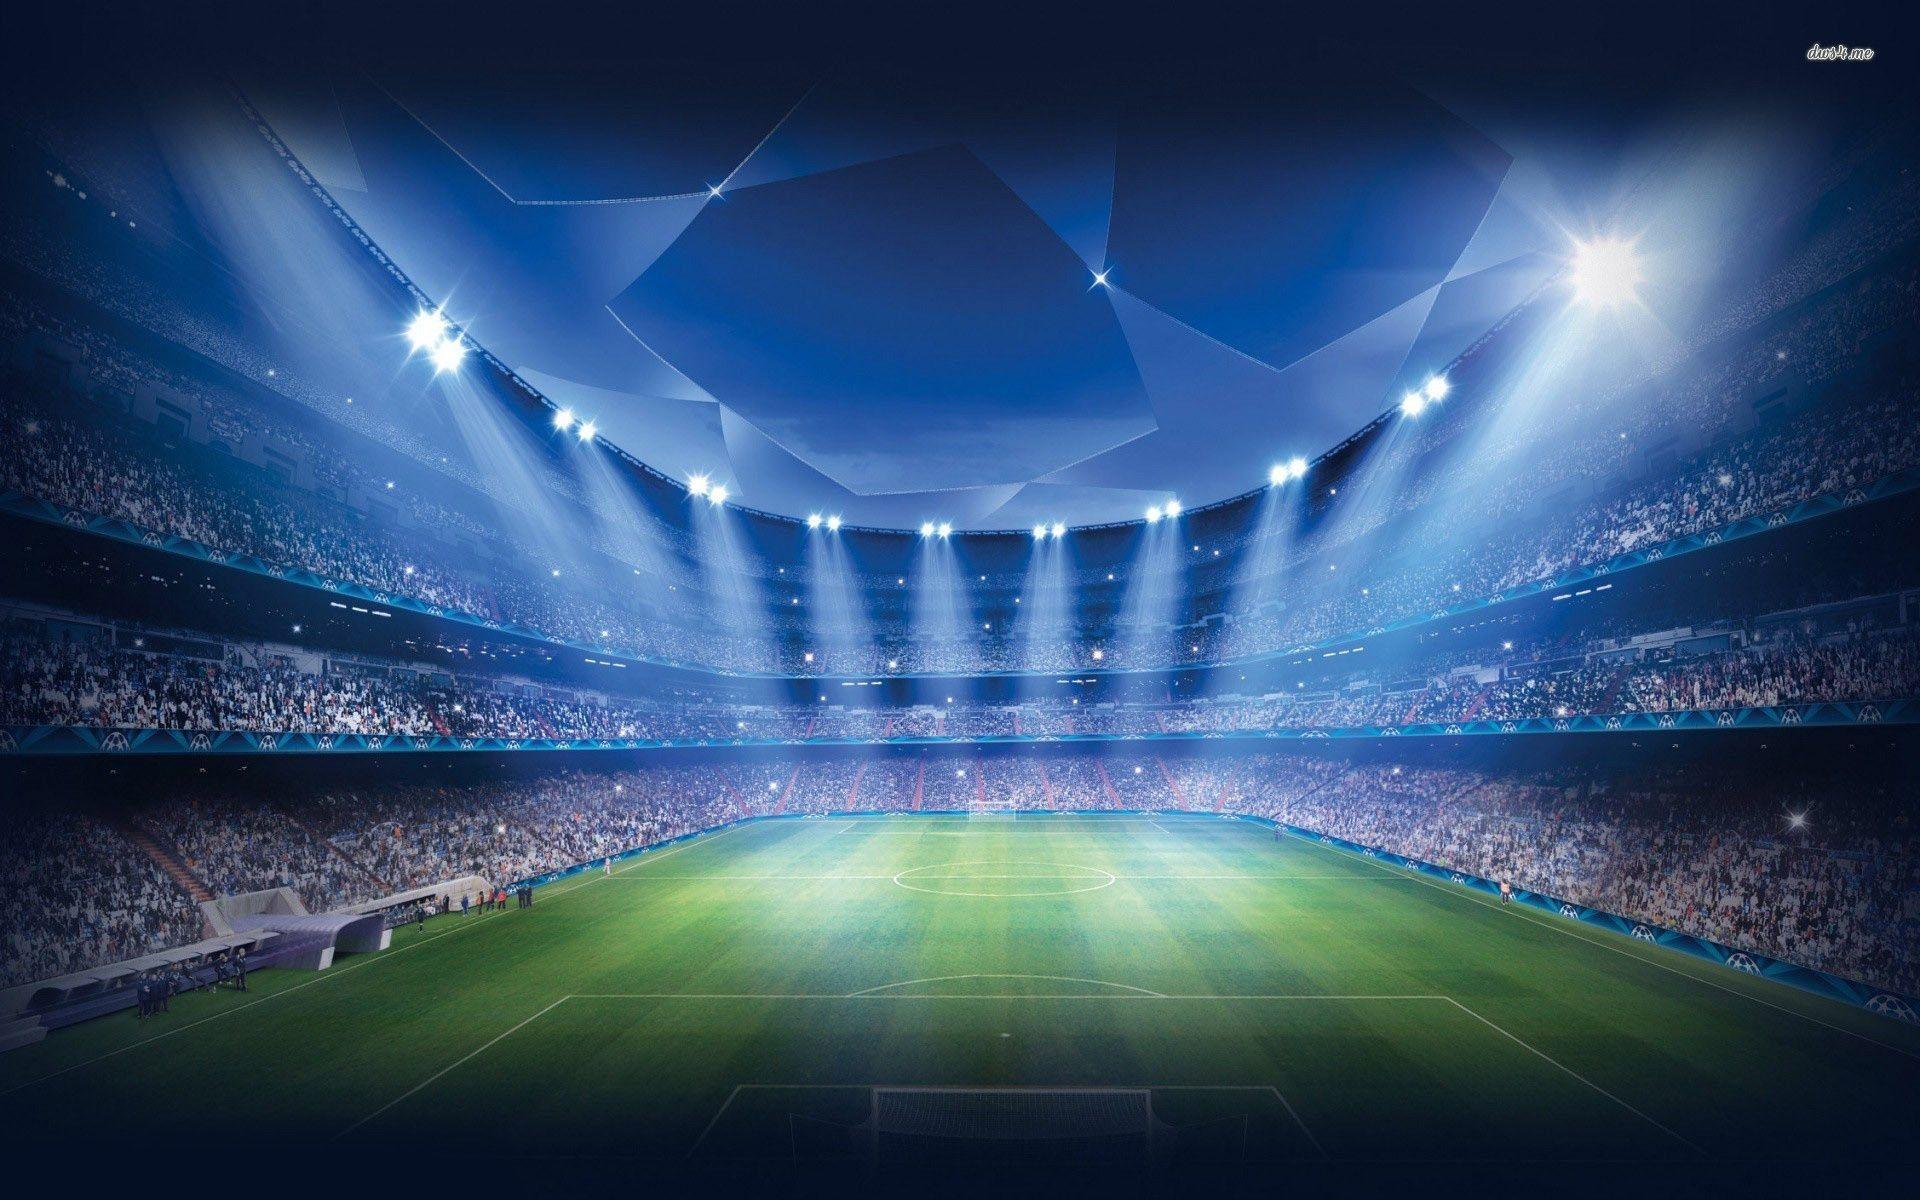 Soccer Stadium Wallpapers Top Free Soccer Stadium Backgrounds Wallpaperaccess